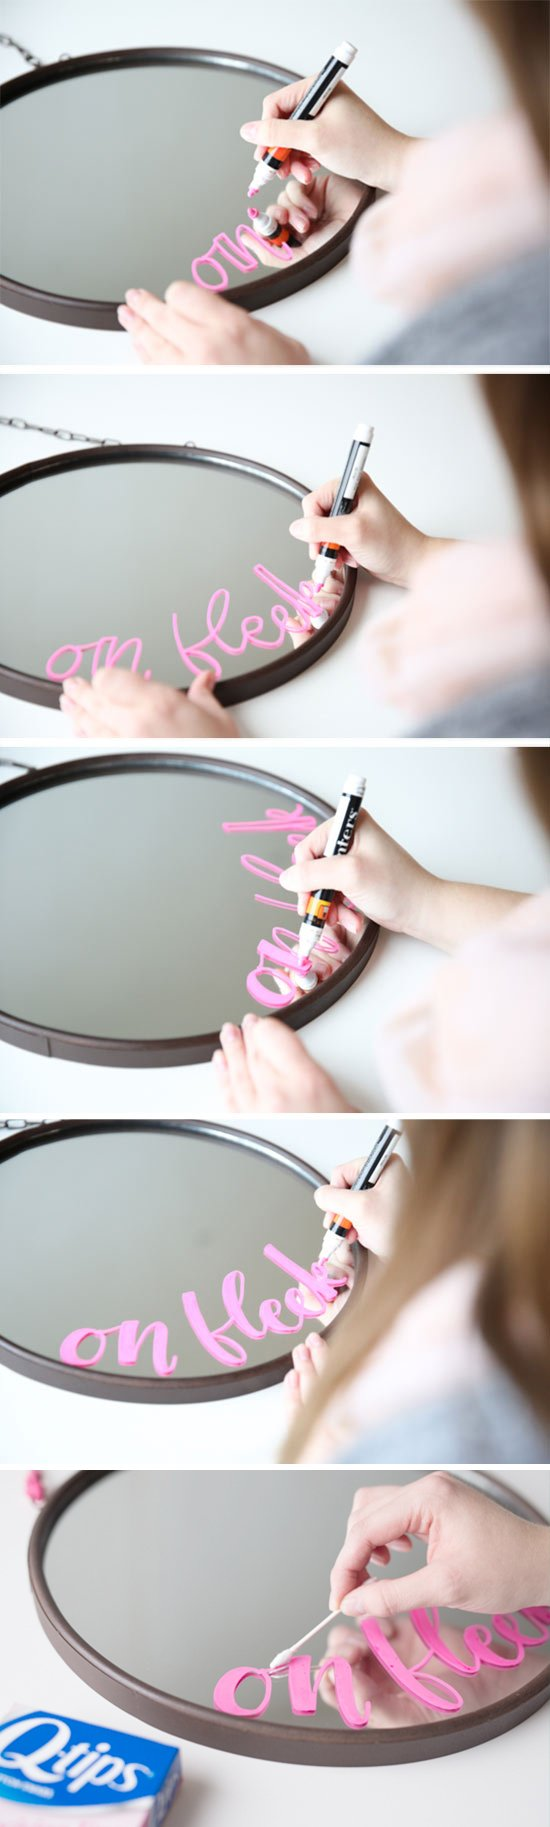 DIY Idea // how to create a hand lettered DIY 'ON FLEEK' vanity mirror